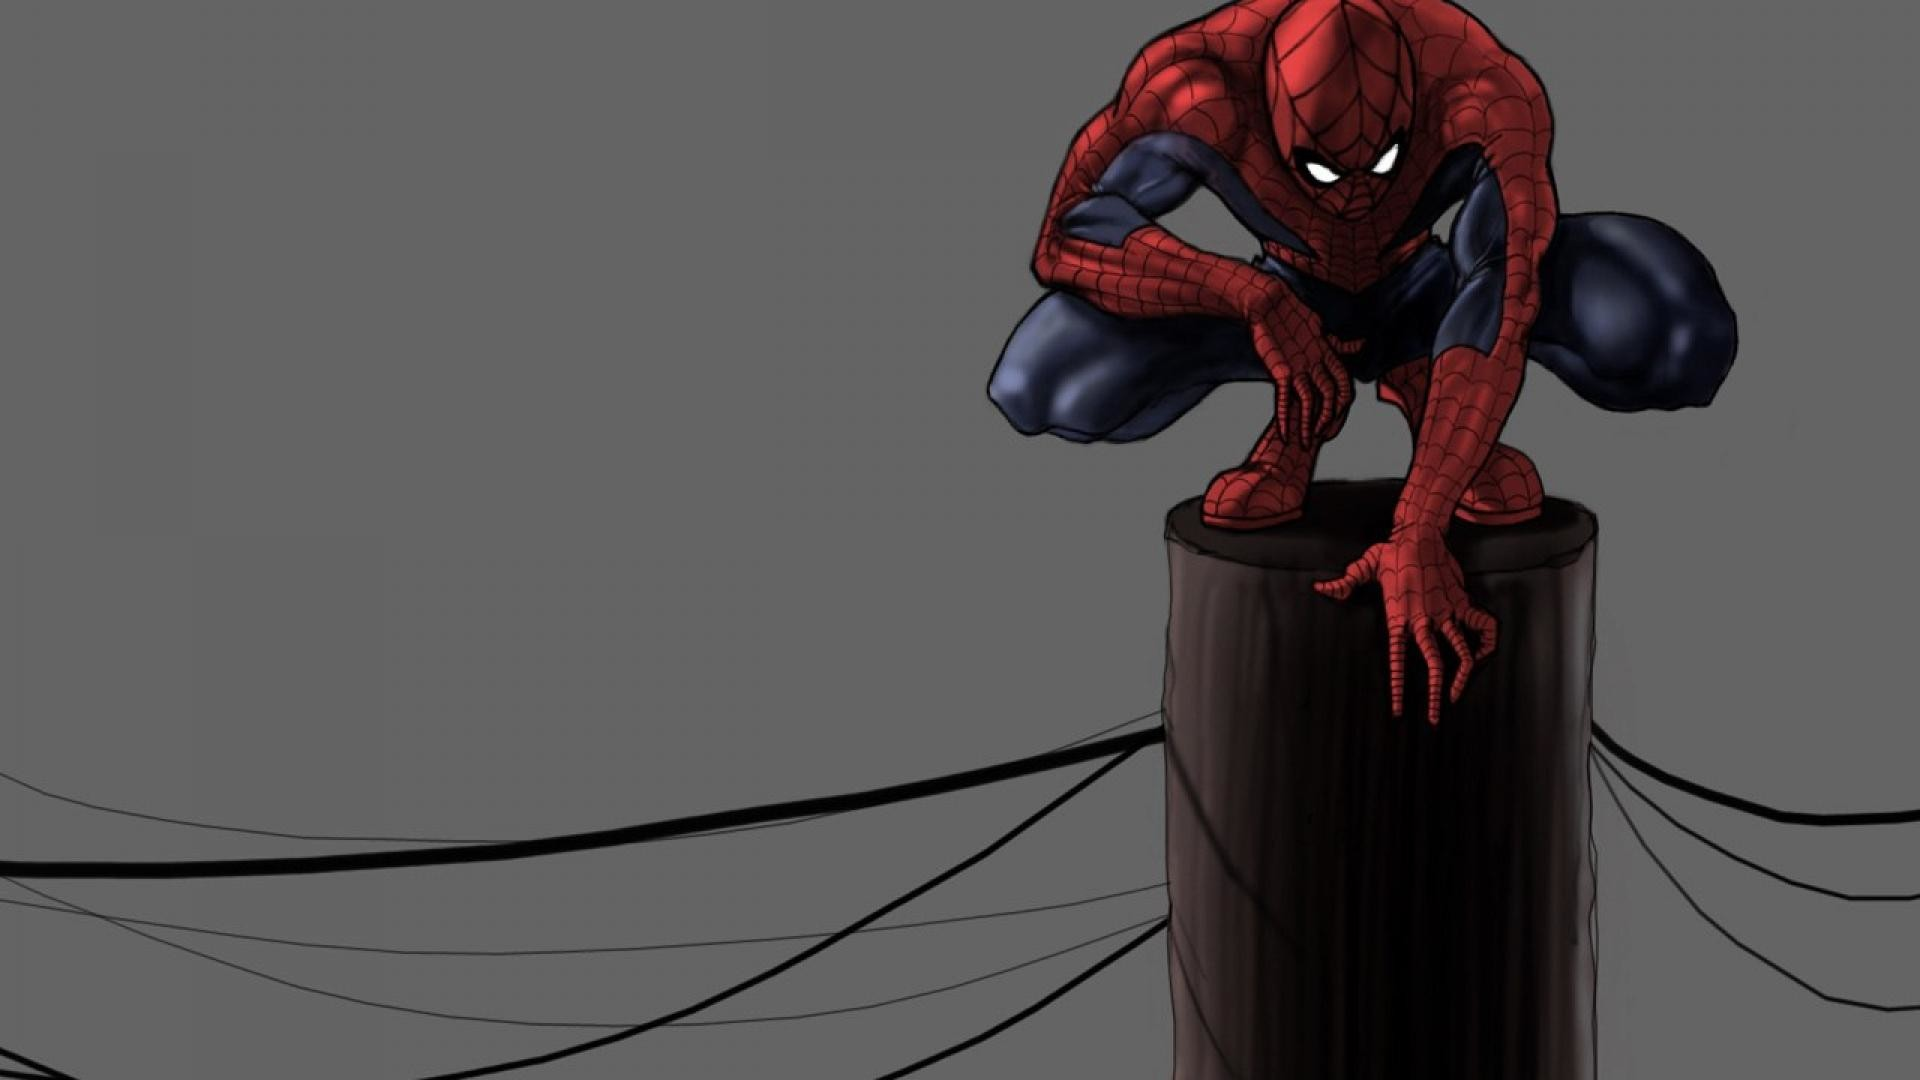 <b>Spiderman</b> Venom <b>Wallpapers</b